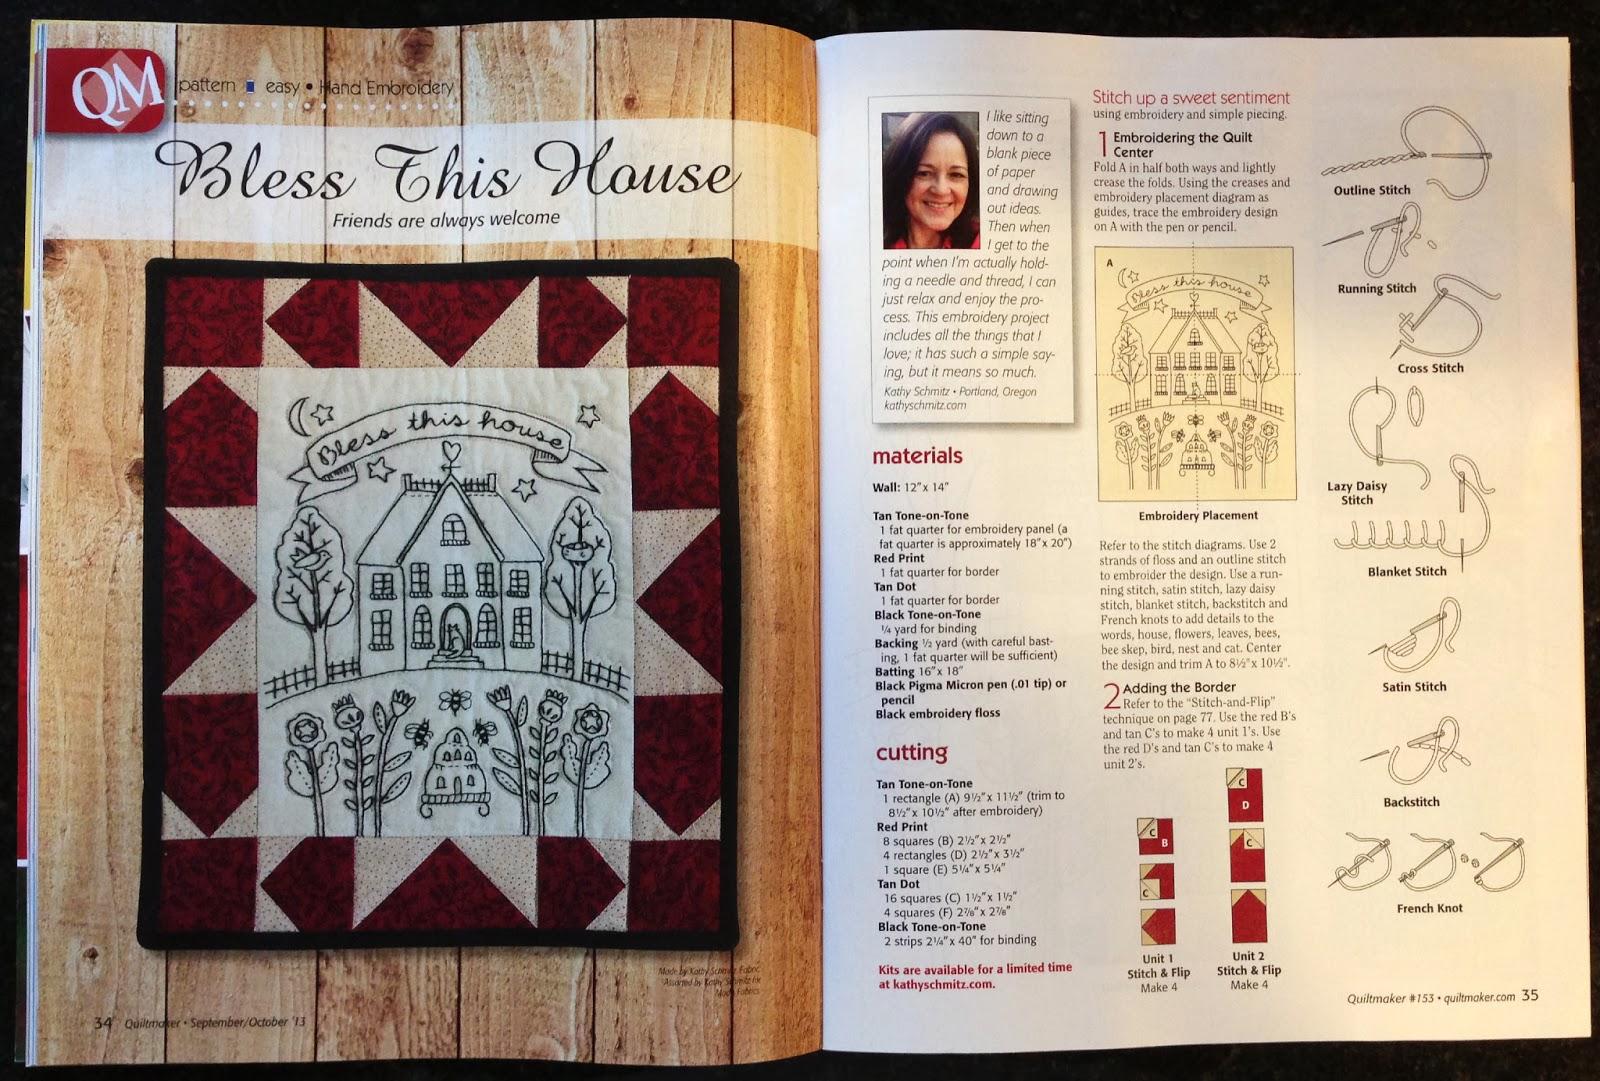 Quiltmaker Magazine Sept/Oct 2009 No.129